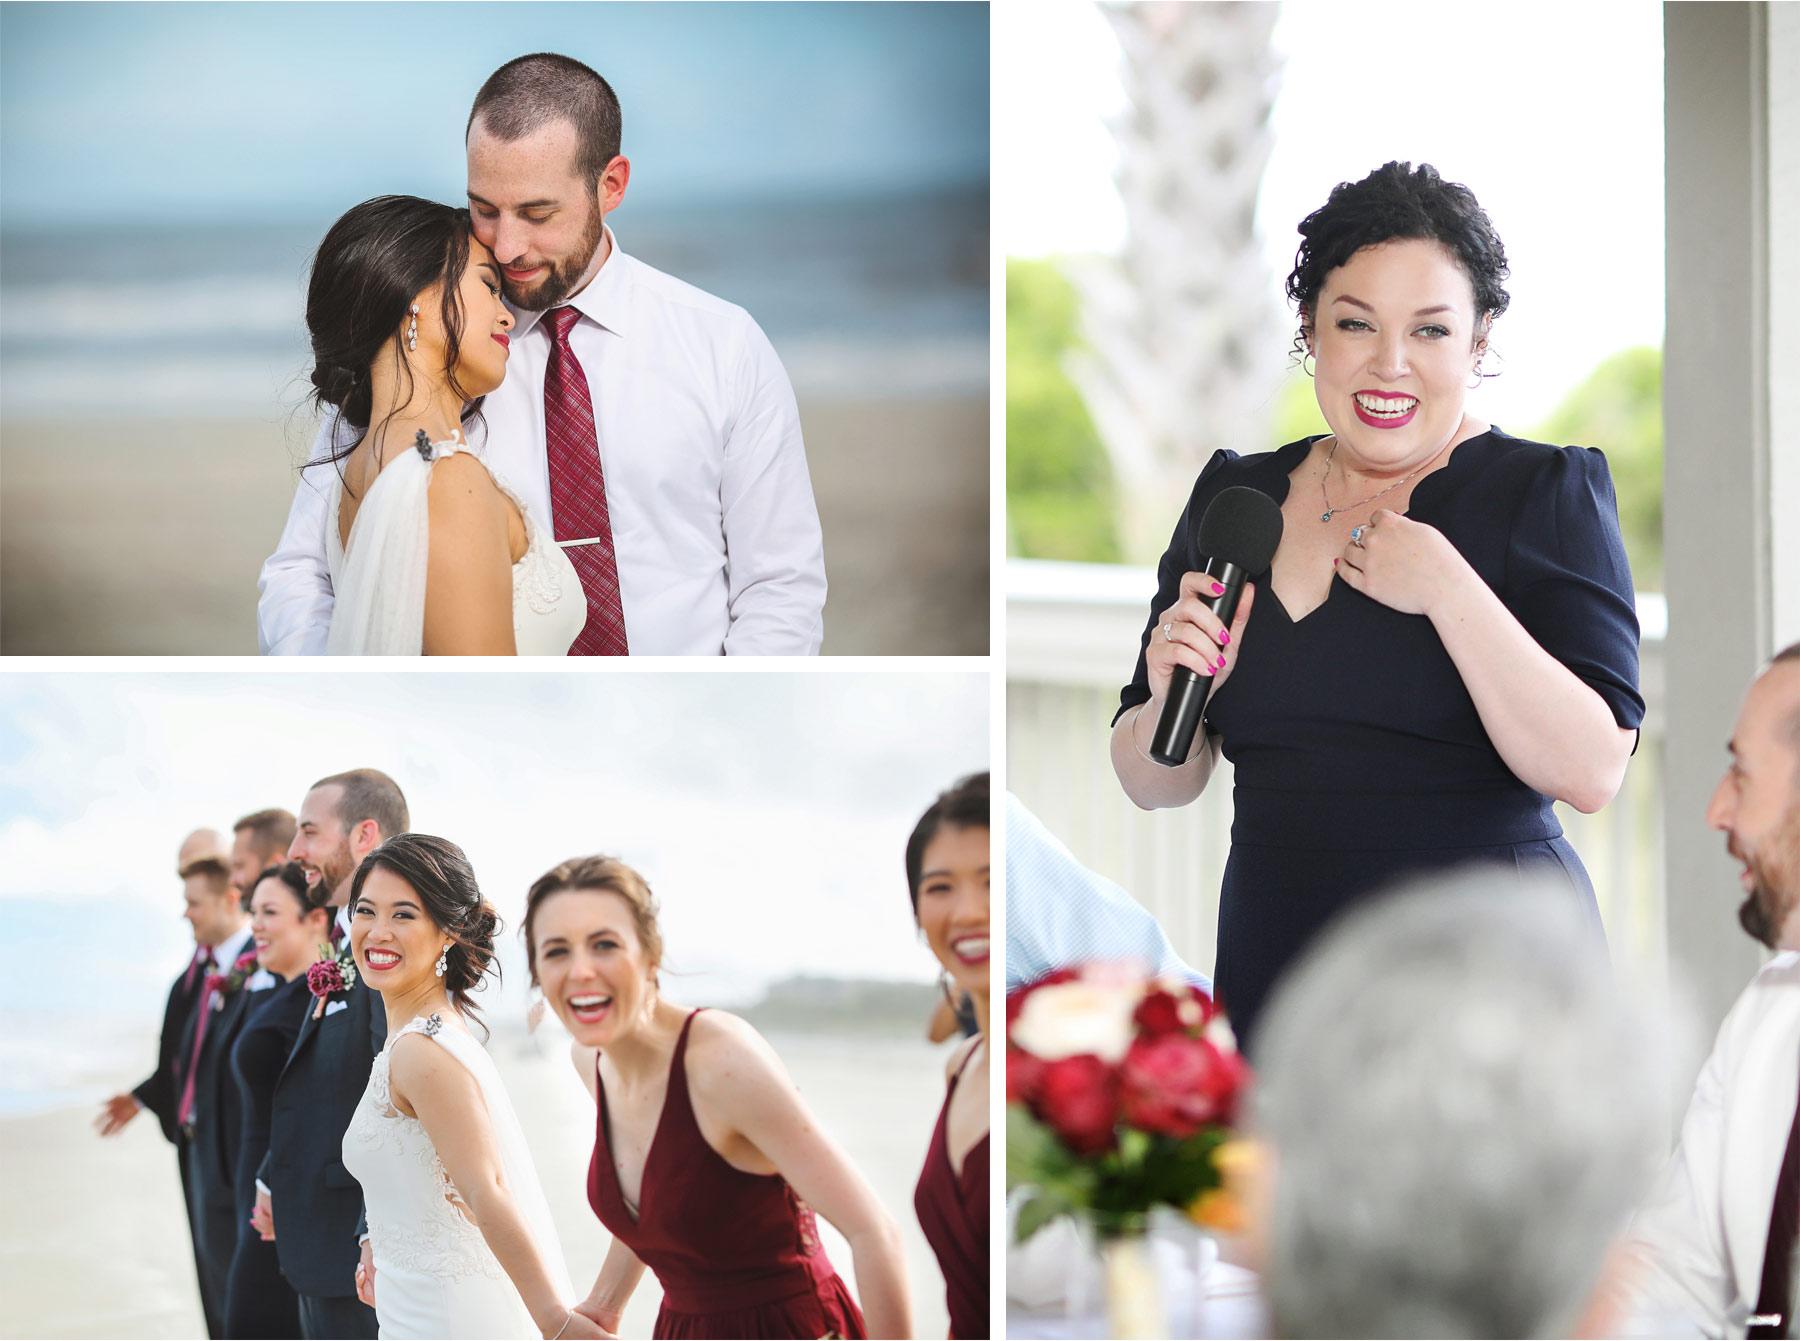 22-South-Carolina-Wedding-by-Vick-Photography-Hilton-Head-Island-Omni-Oceanfront-Hotel-Destination-Beach-Ocean-Bride-Groom-Toasts-Felyn-and-Will.jpg